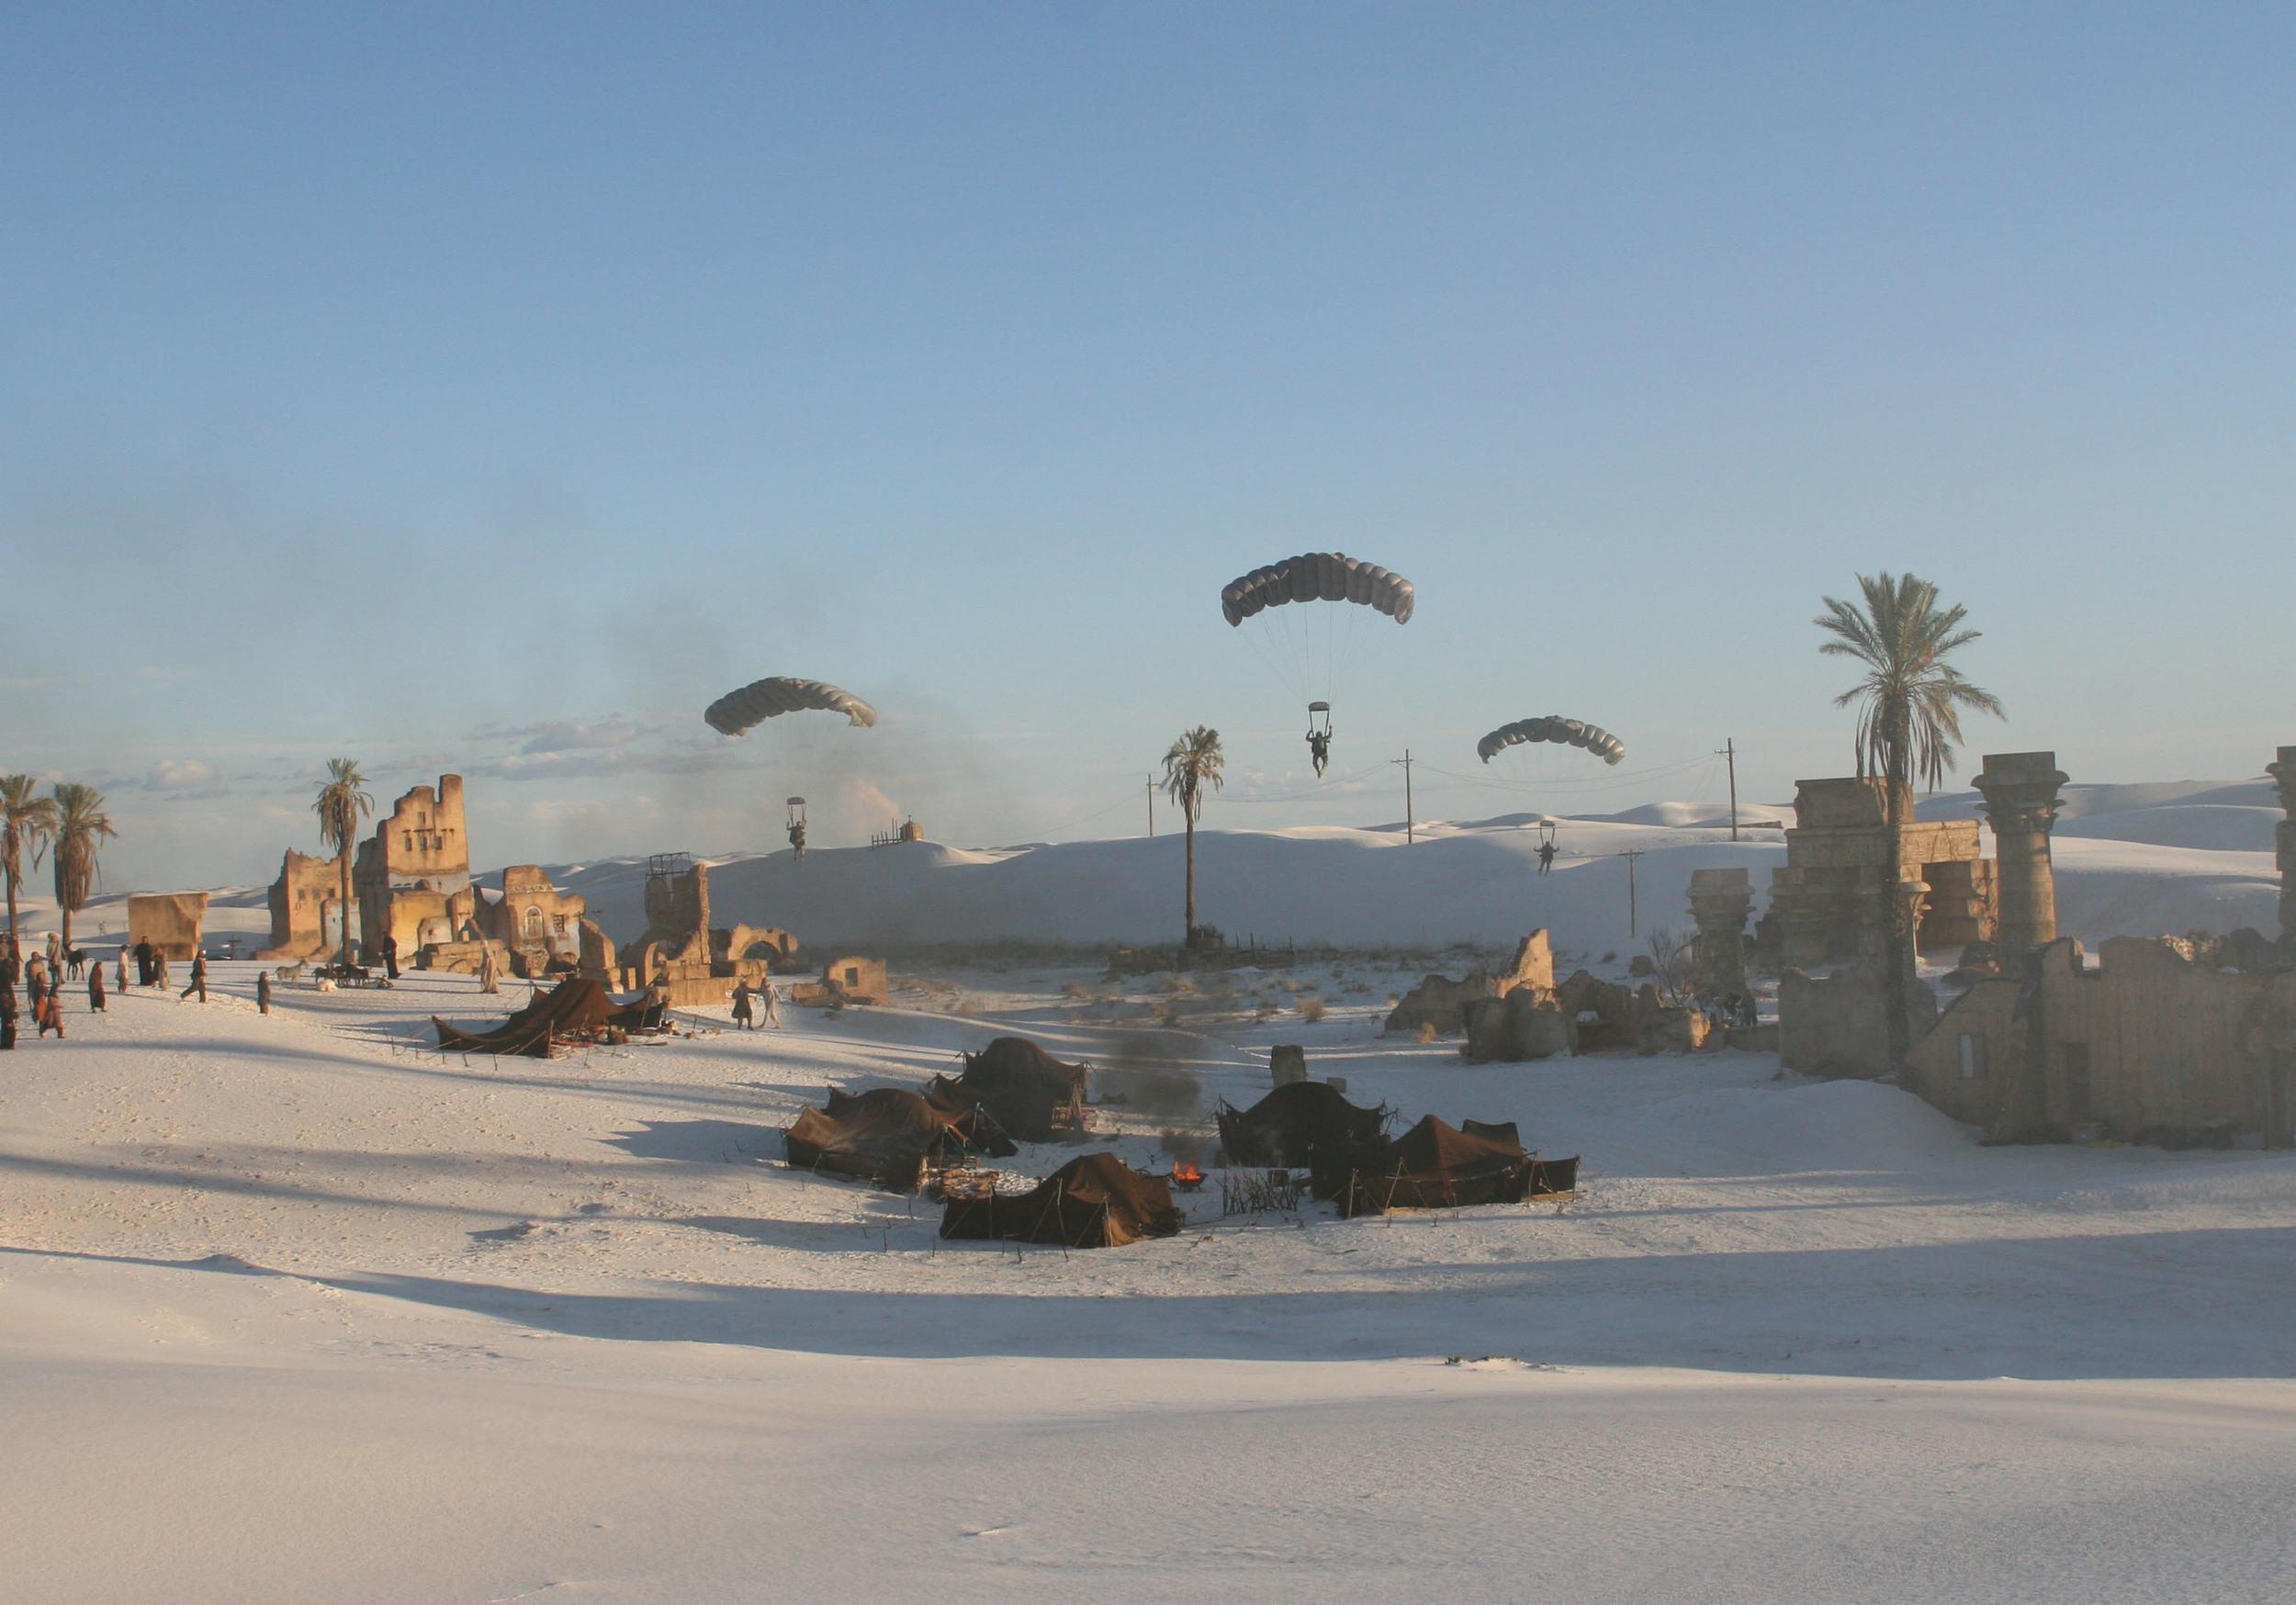 Tactical Flight Training